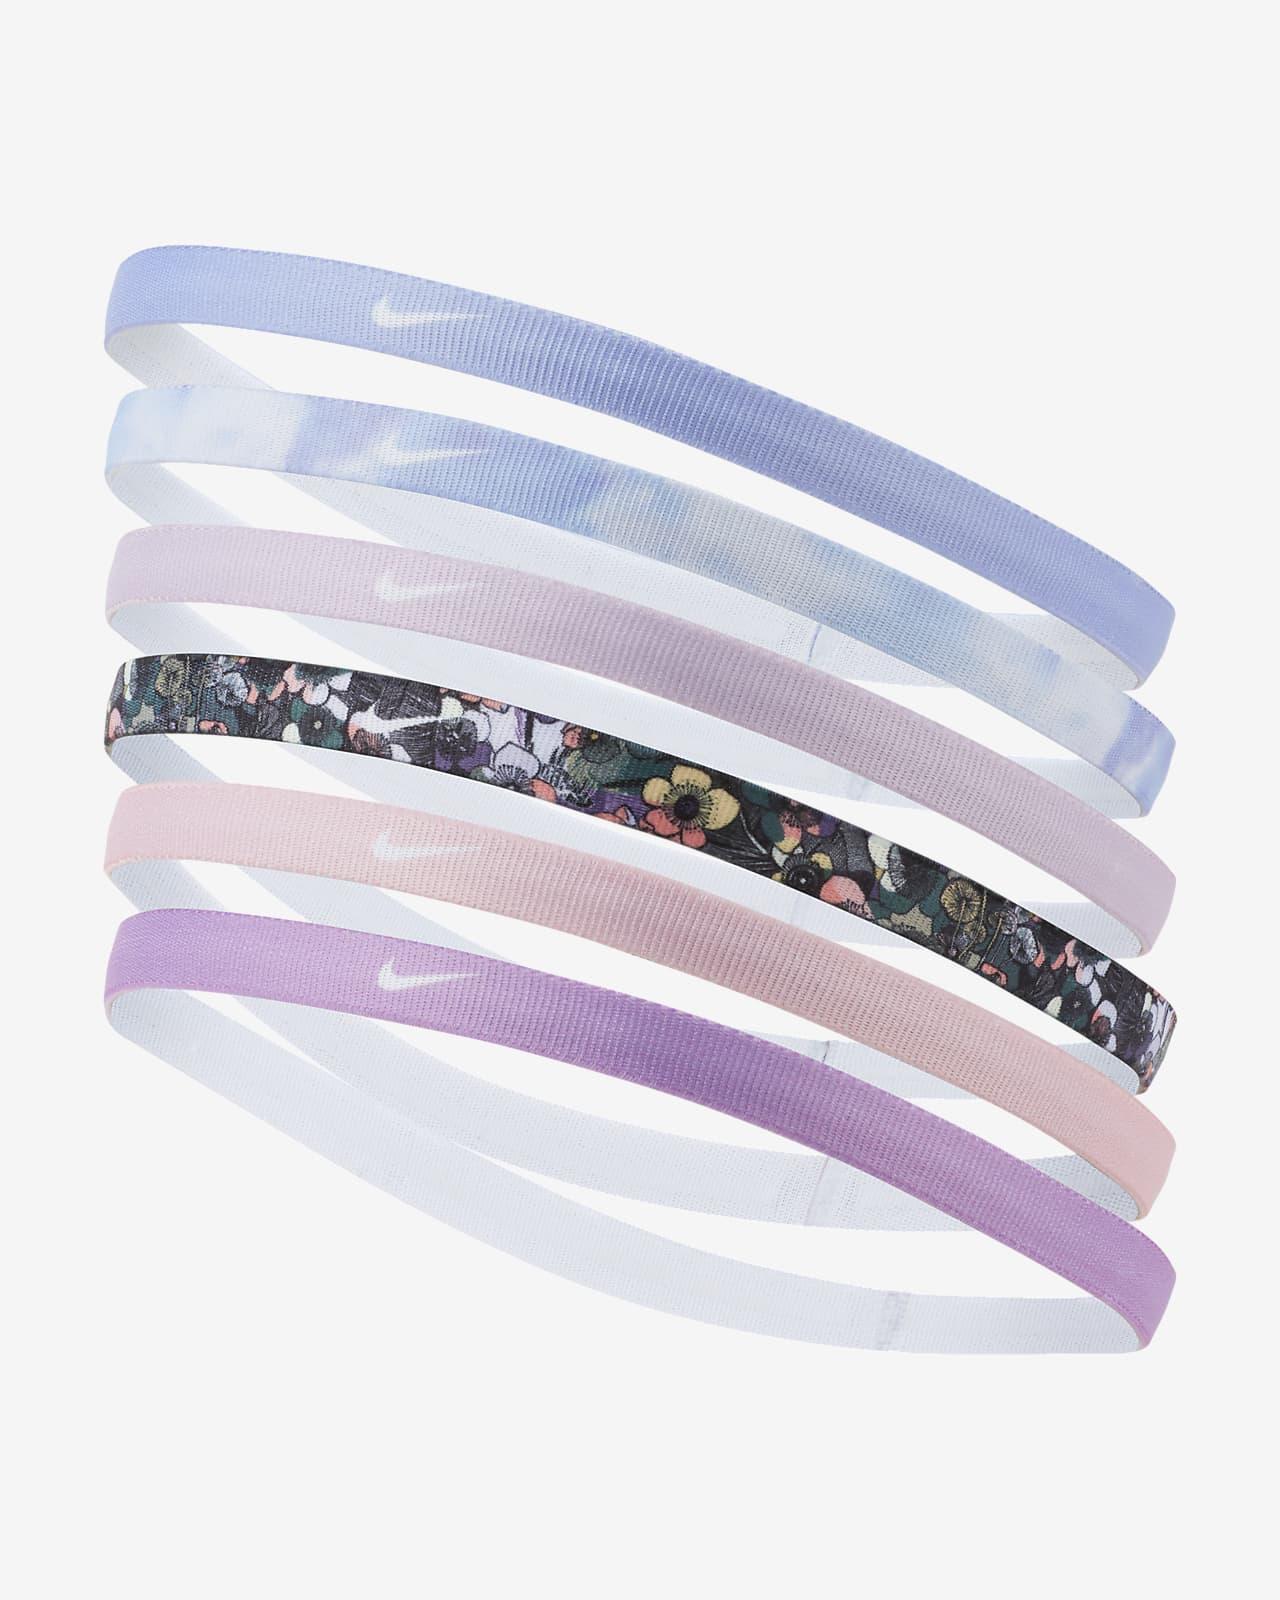 Nike Tie-Dye Headbands (6-Pack)